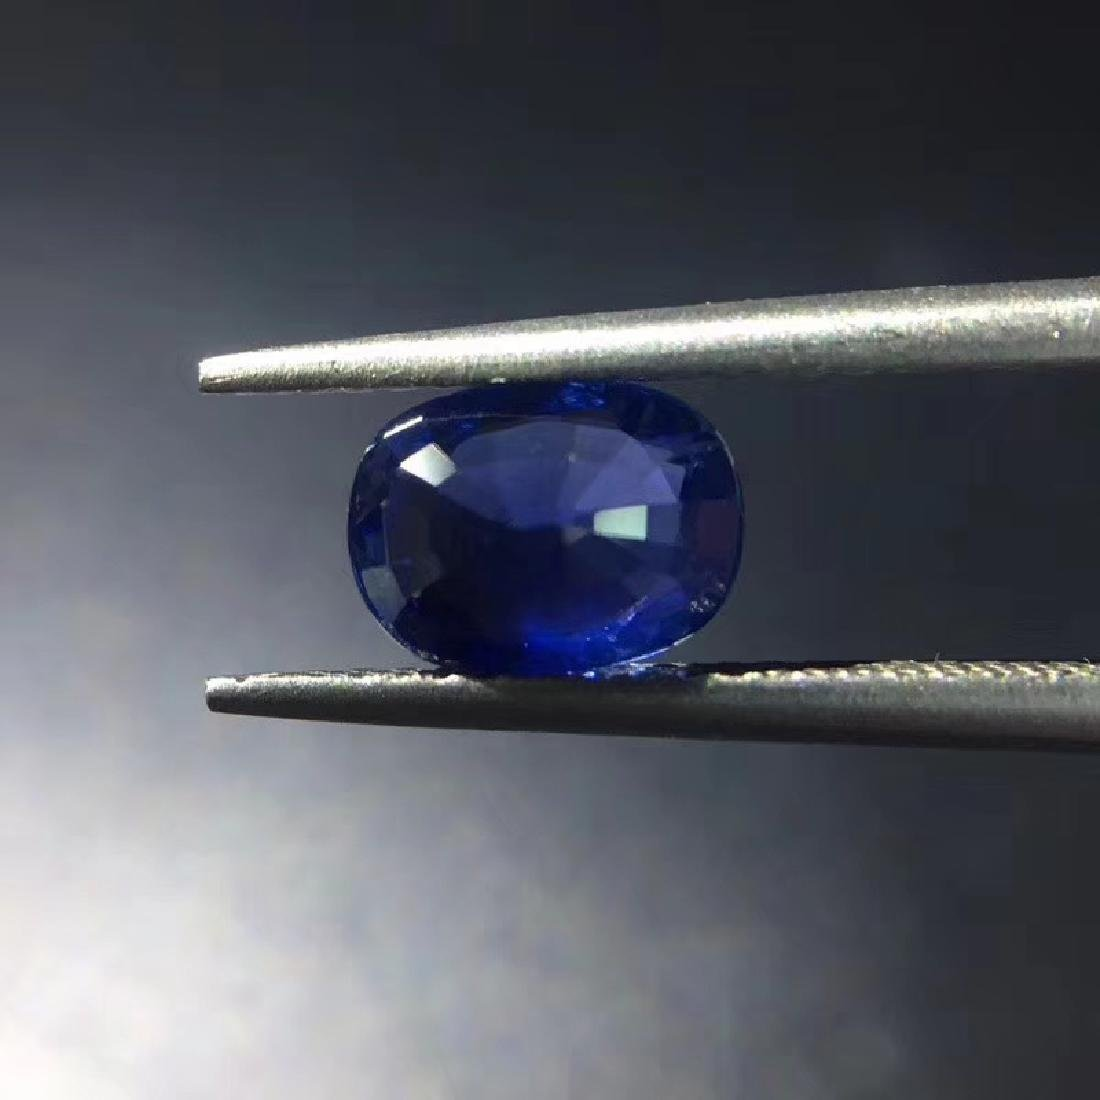 1.43 ct Sapphire 5.8*7.6*3.4 mm Oval Cut - 5